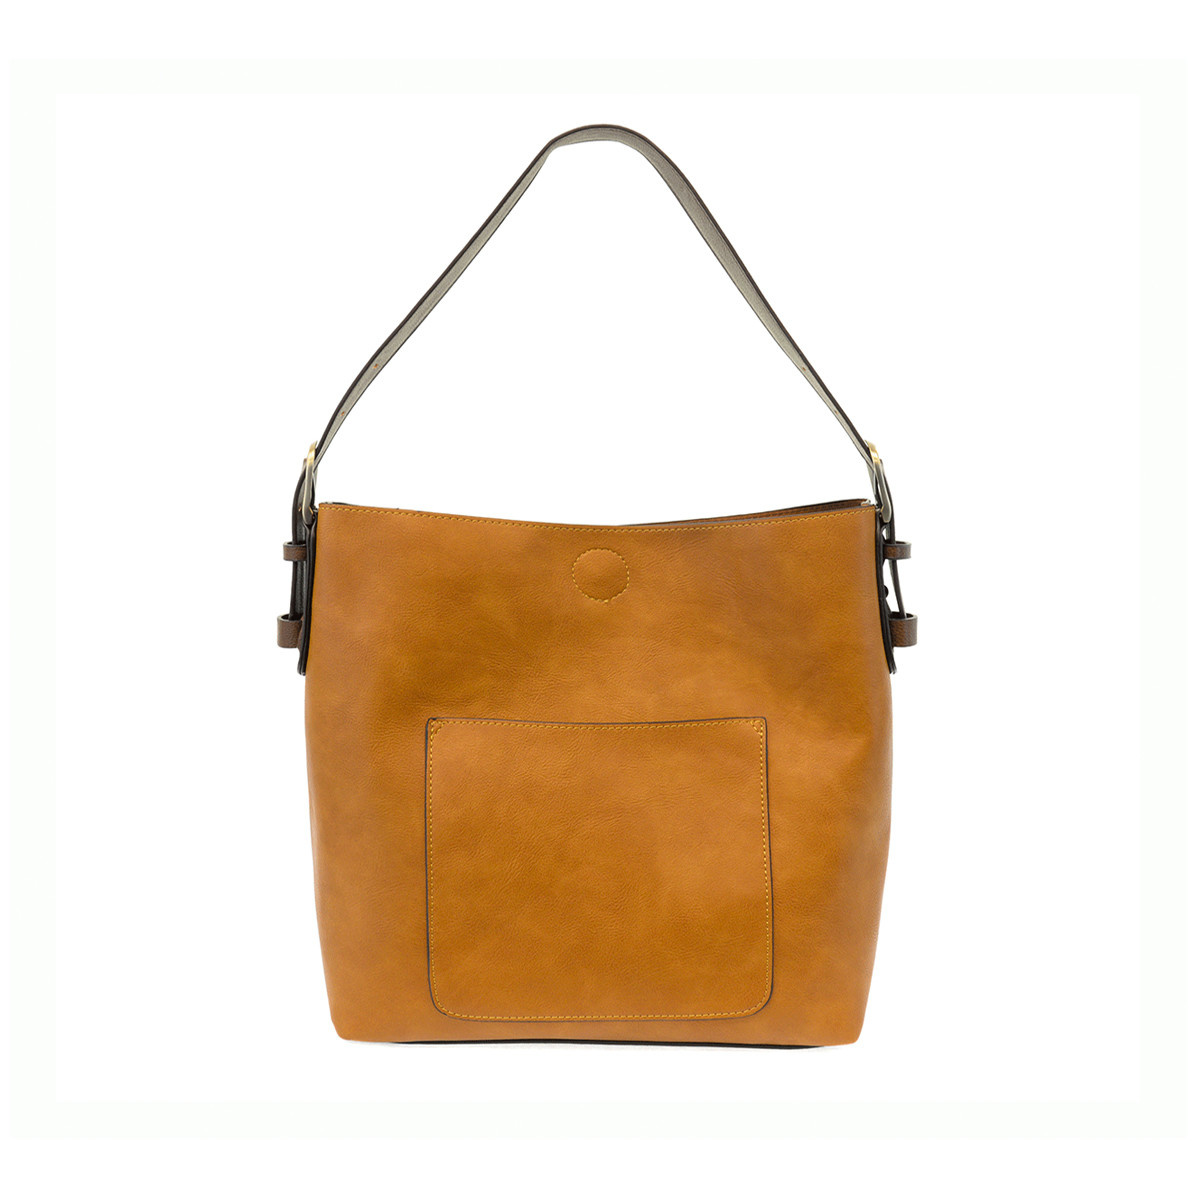 Joy Susan Joy Susan Classic Hobo Handbag Honey